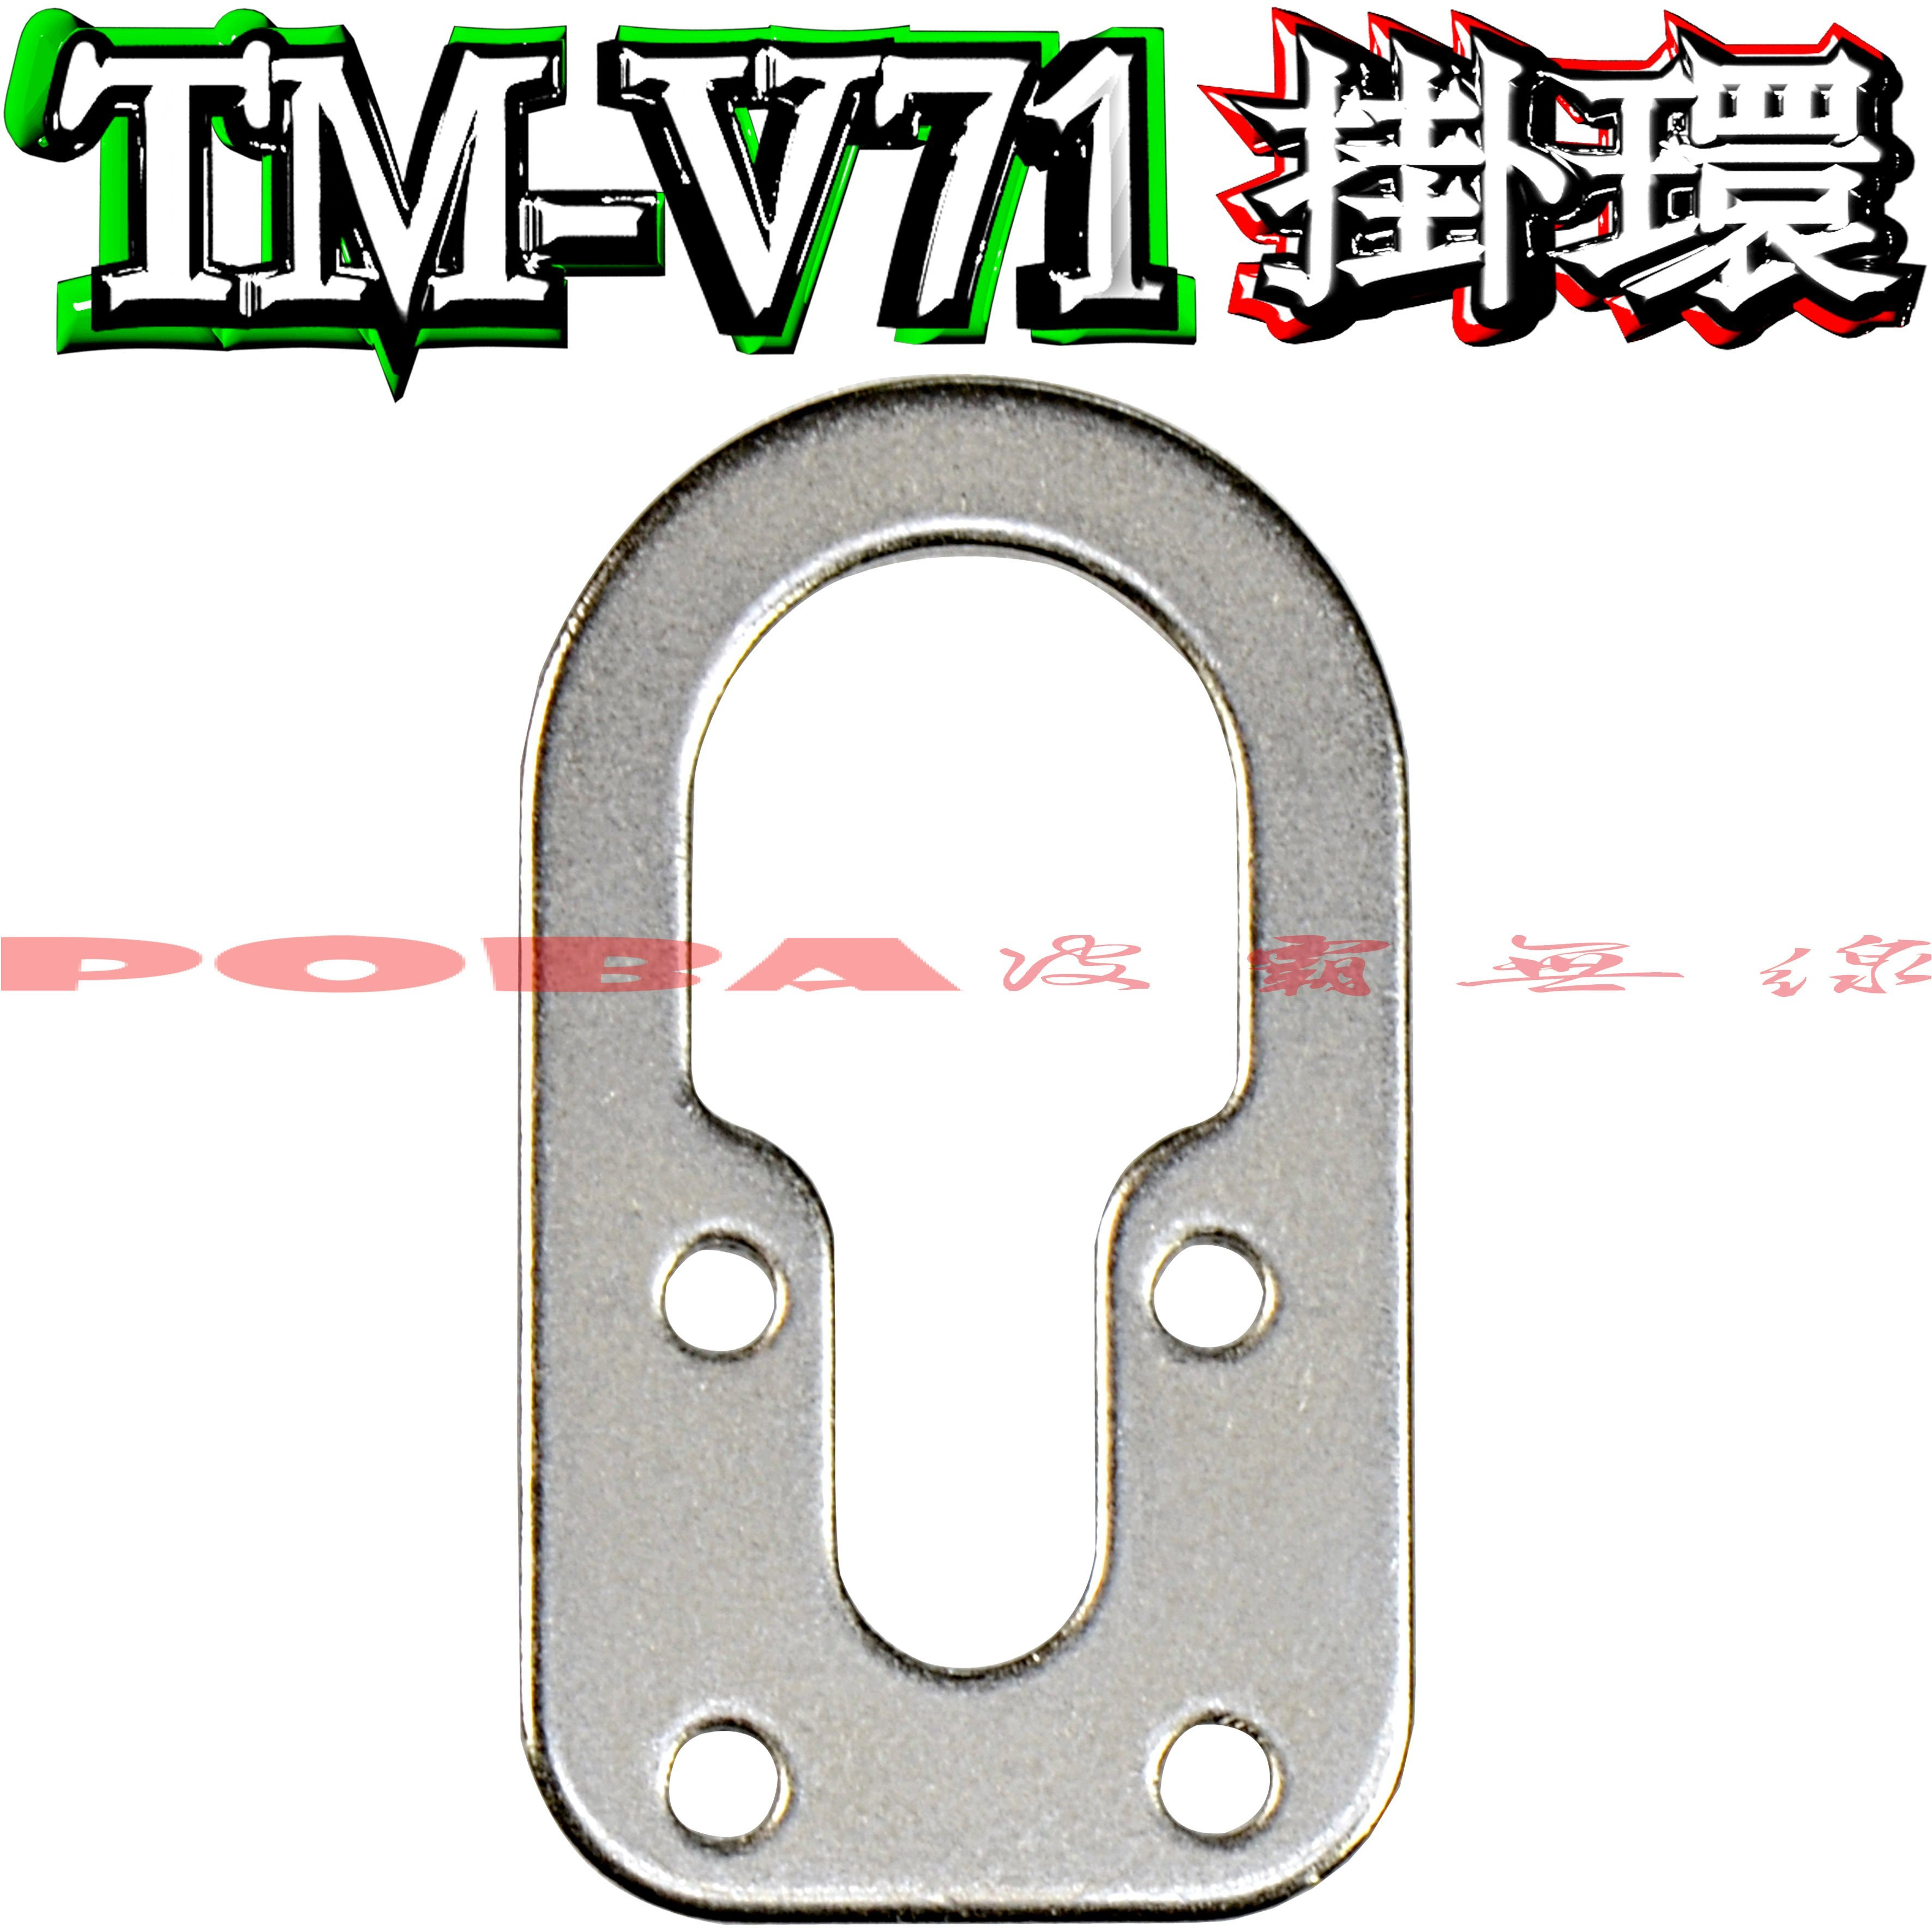 TM-V71A圓形掛環 TM-V71A圓形掛架 手持麥克風掛環 托咪掛環 掛架 固定架掛架 TM-V71掛勾